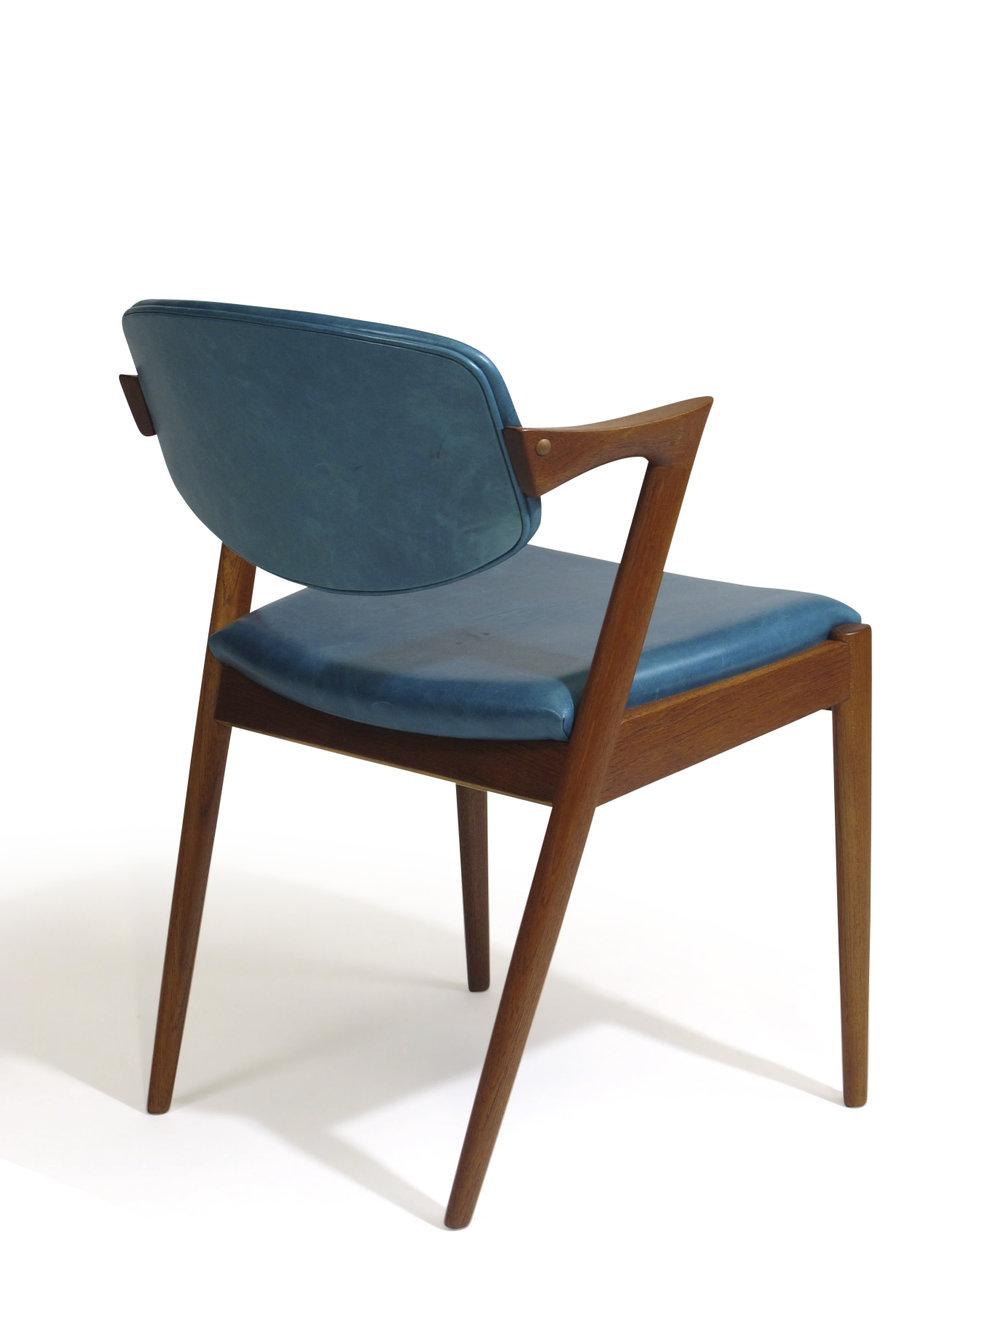 ... Kai Kristiansen Z Dining Chairs In Aqua Blue Leather Midcentury Danish  Modern ...